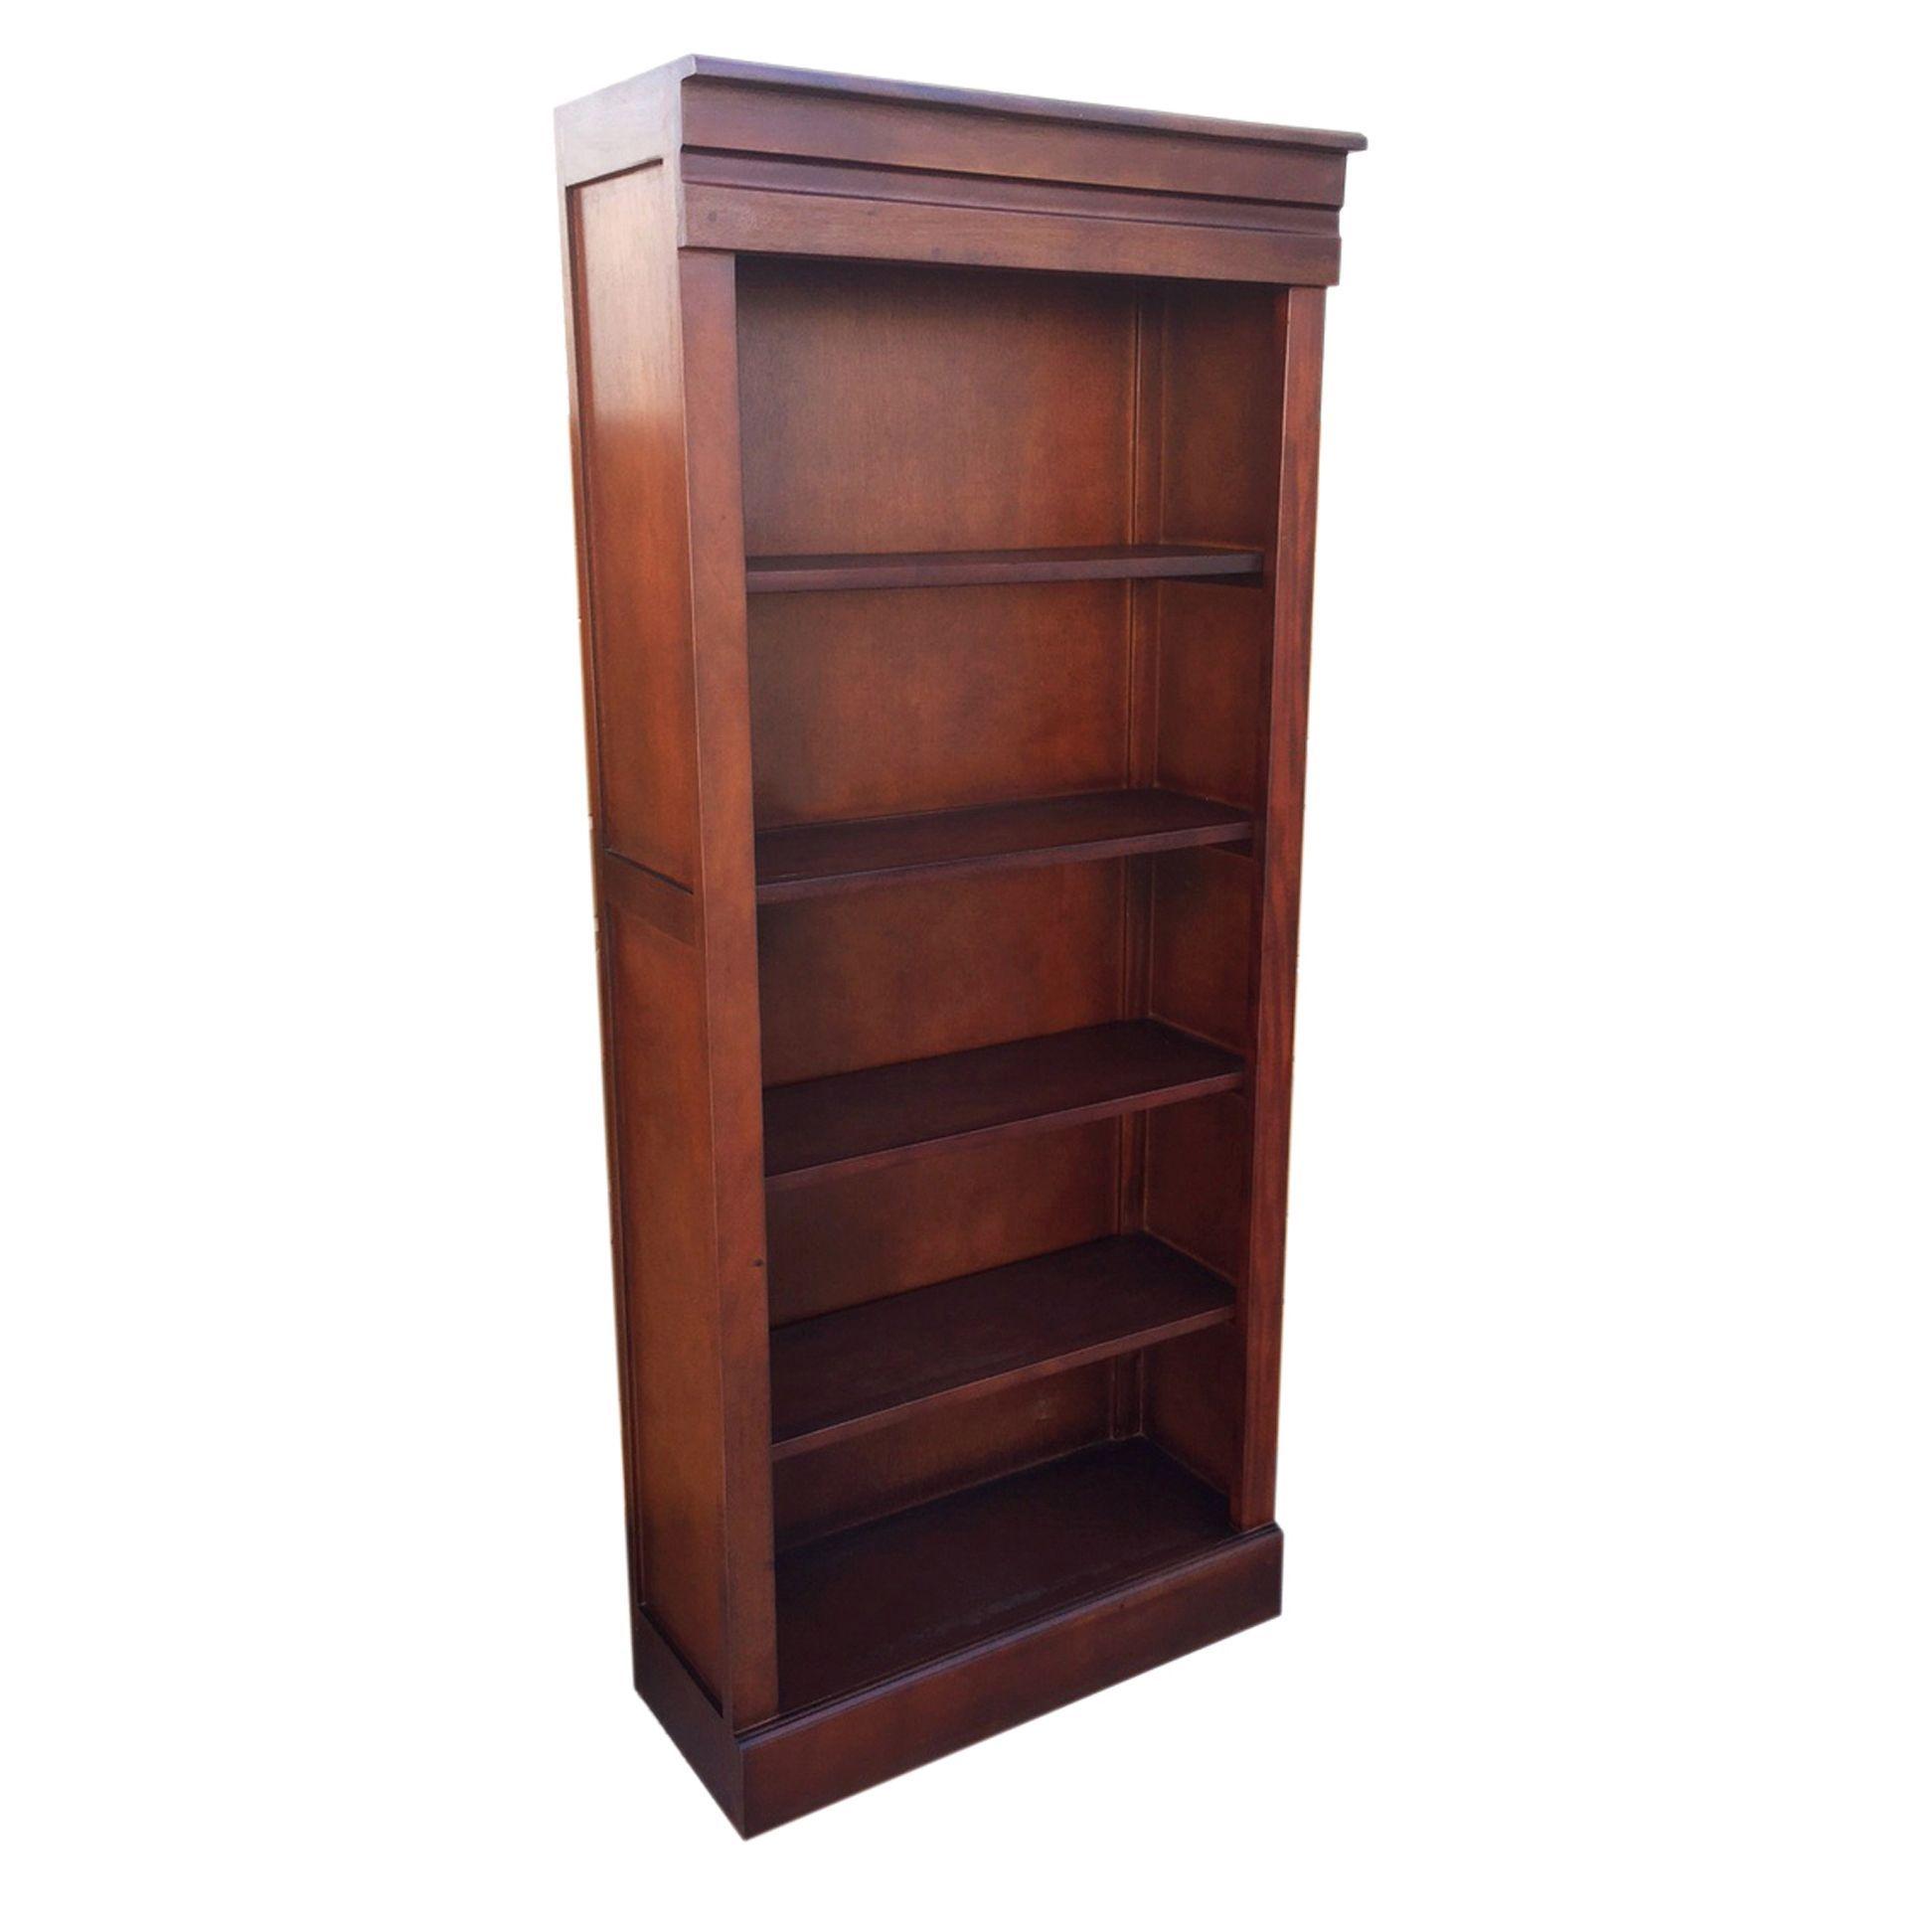 D Art Bellevue Mahogany Wood Tall Bookcase Indonesia Dark Brown